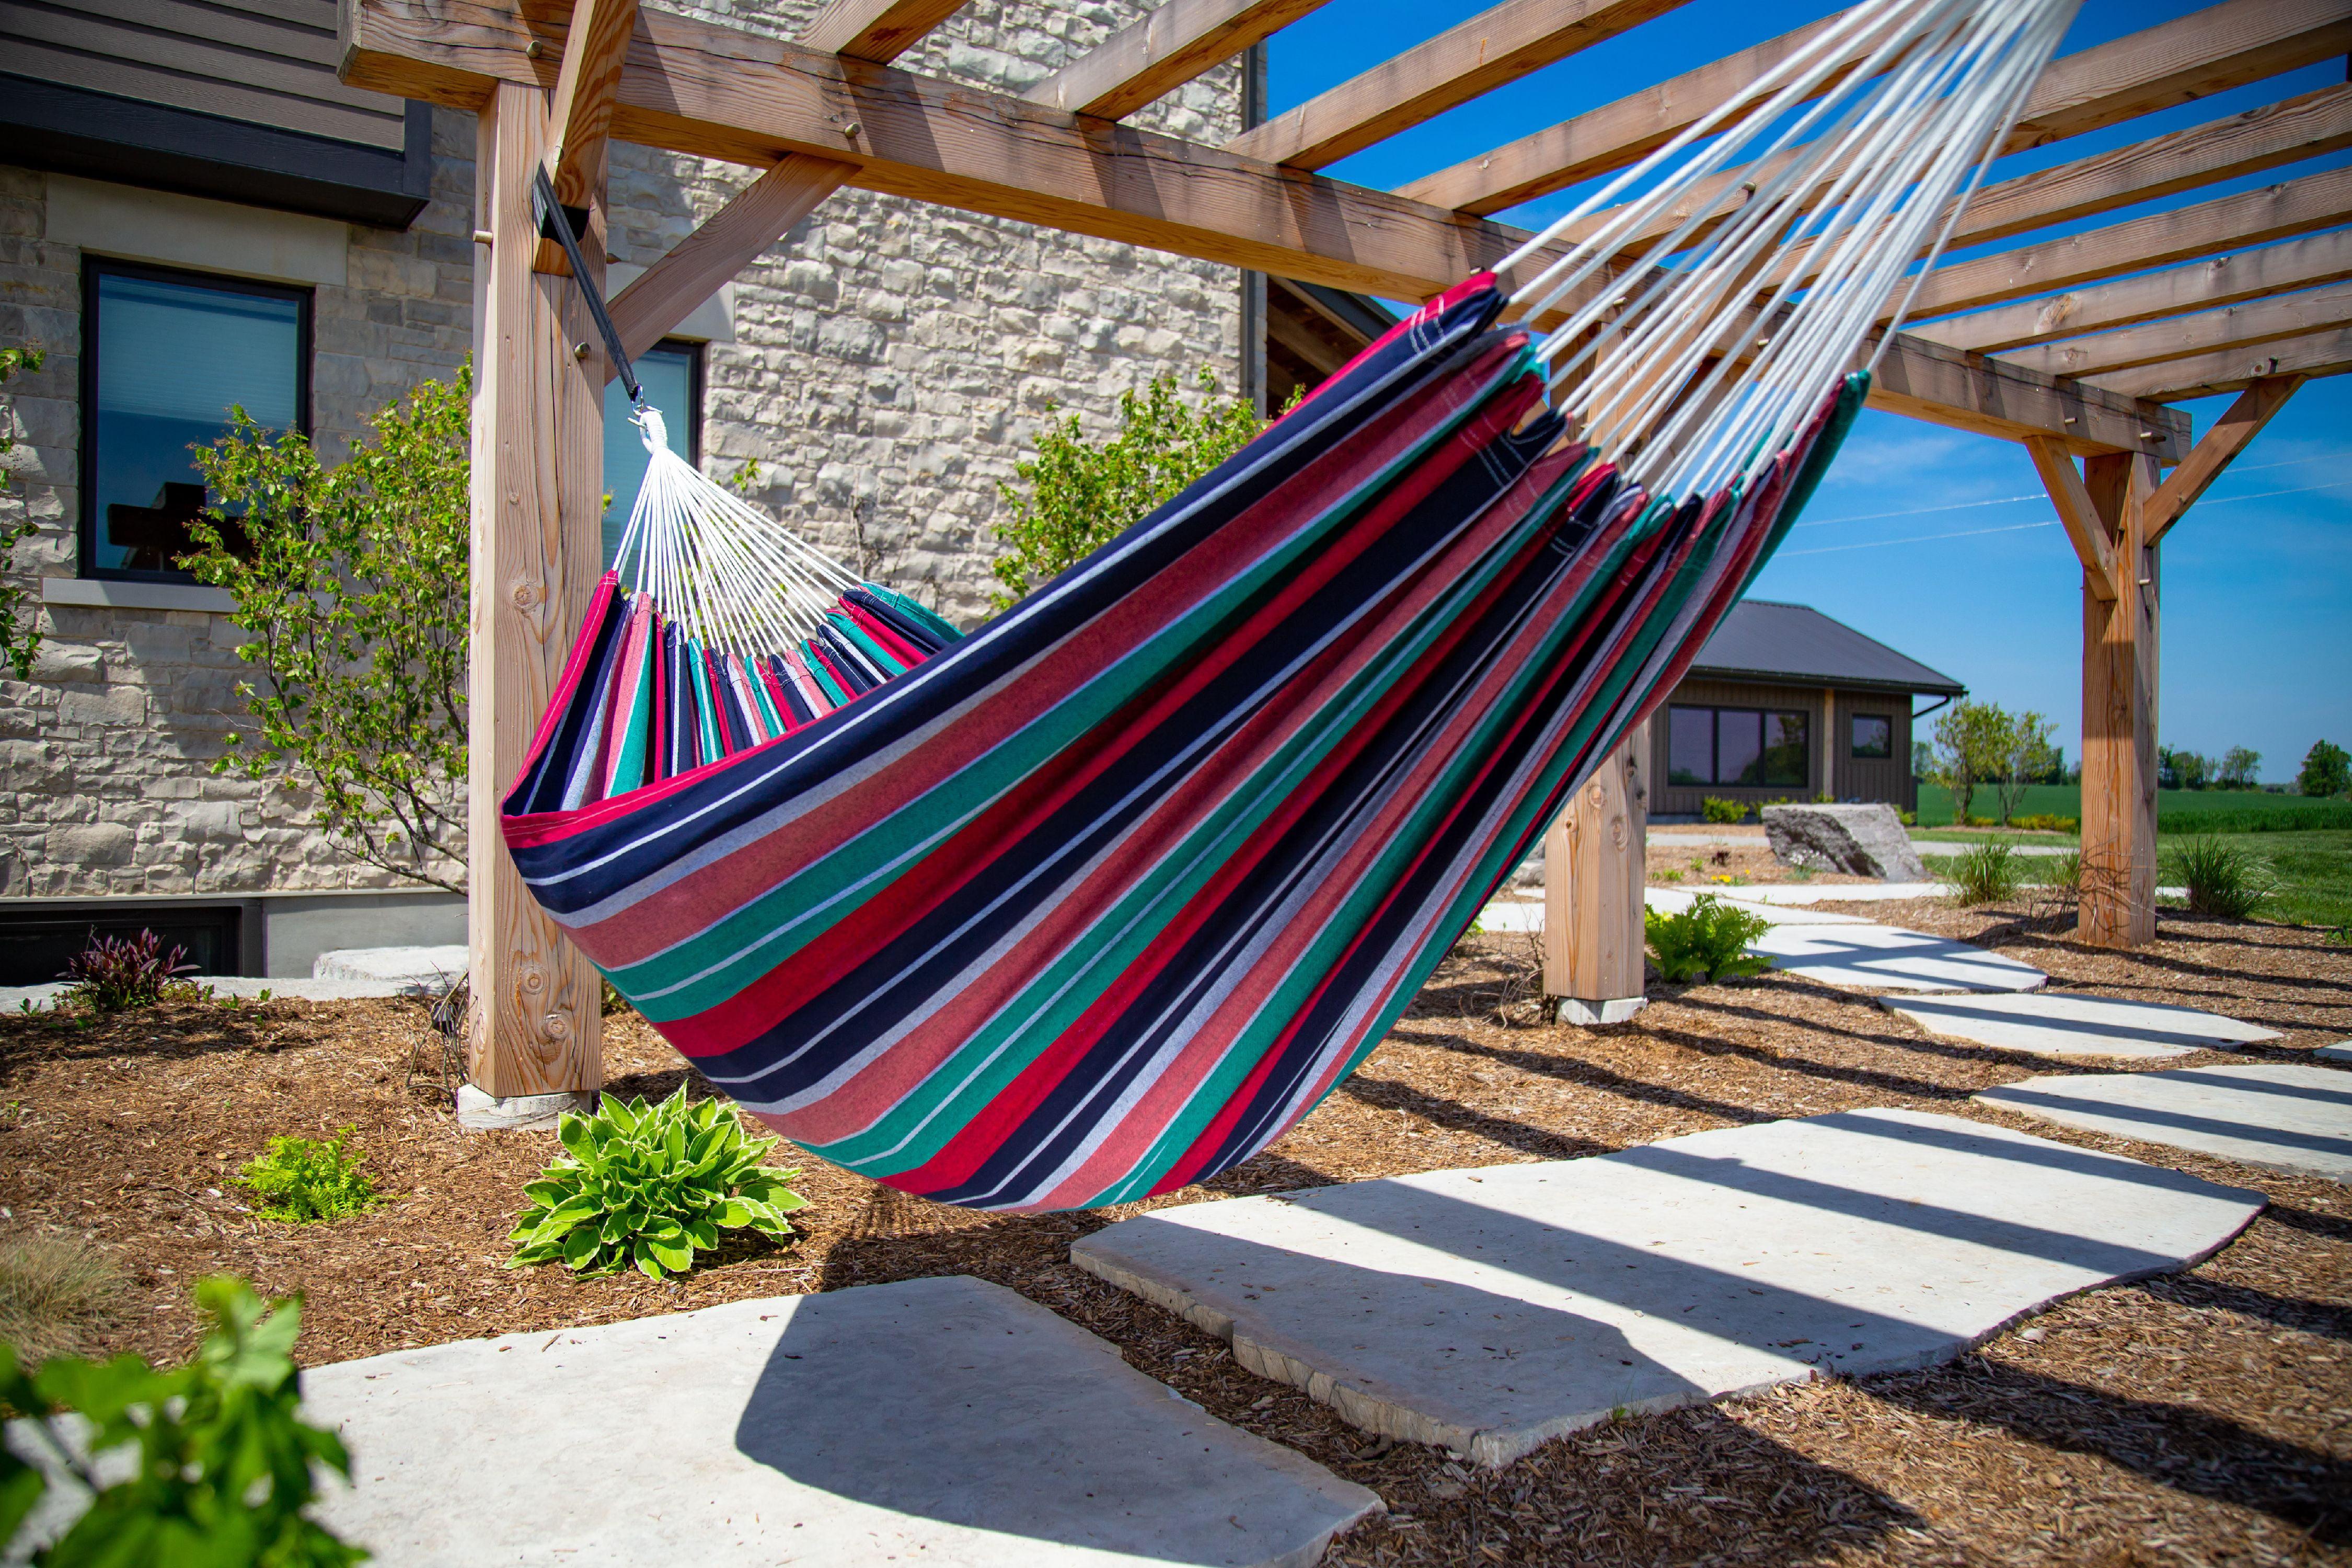 11 Ft Single Hammock Brazilian Cotton Durable Fabric Outdoor Garden Patio Oasis